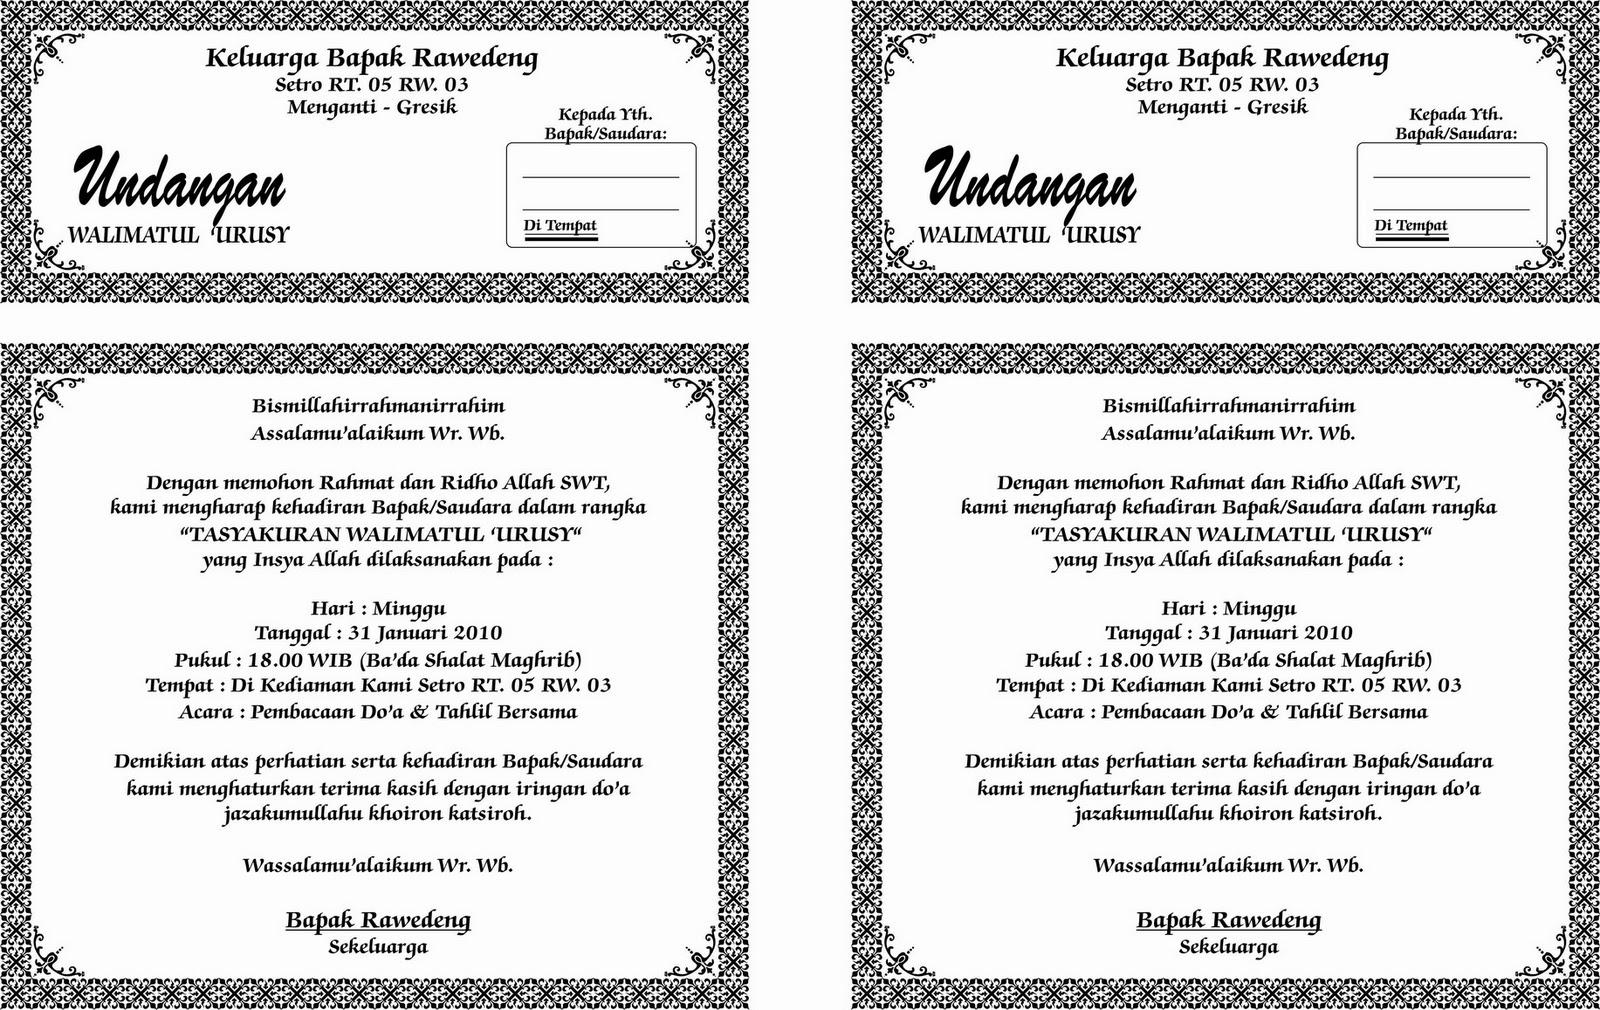 Contoh Undangan Walimah Format Word - Contoh Isi Undangan